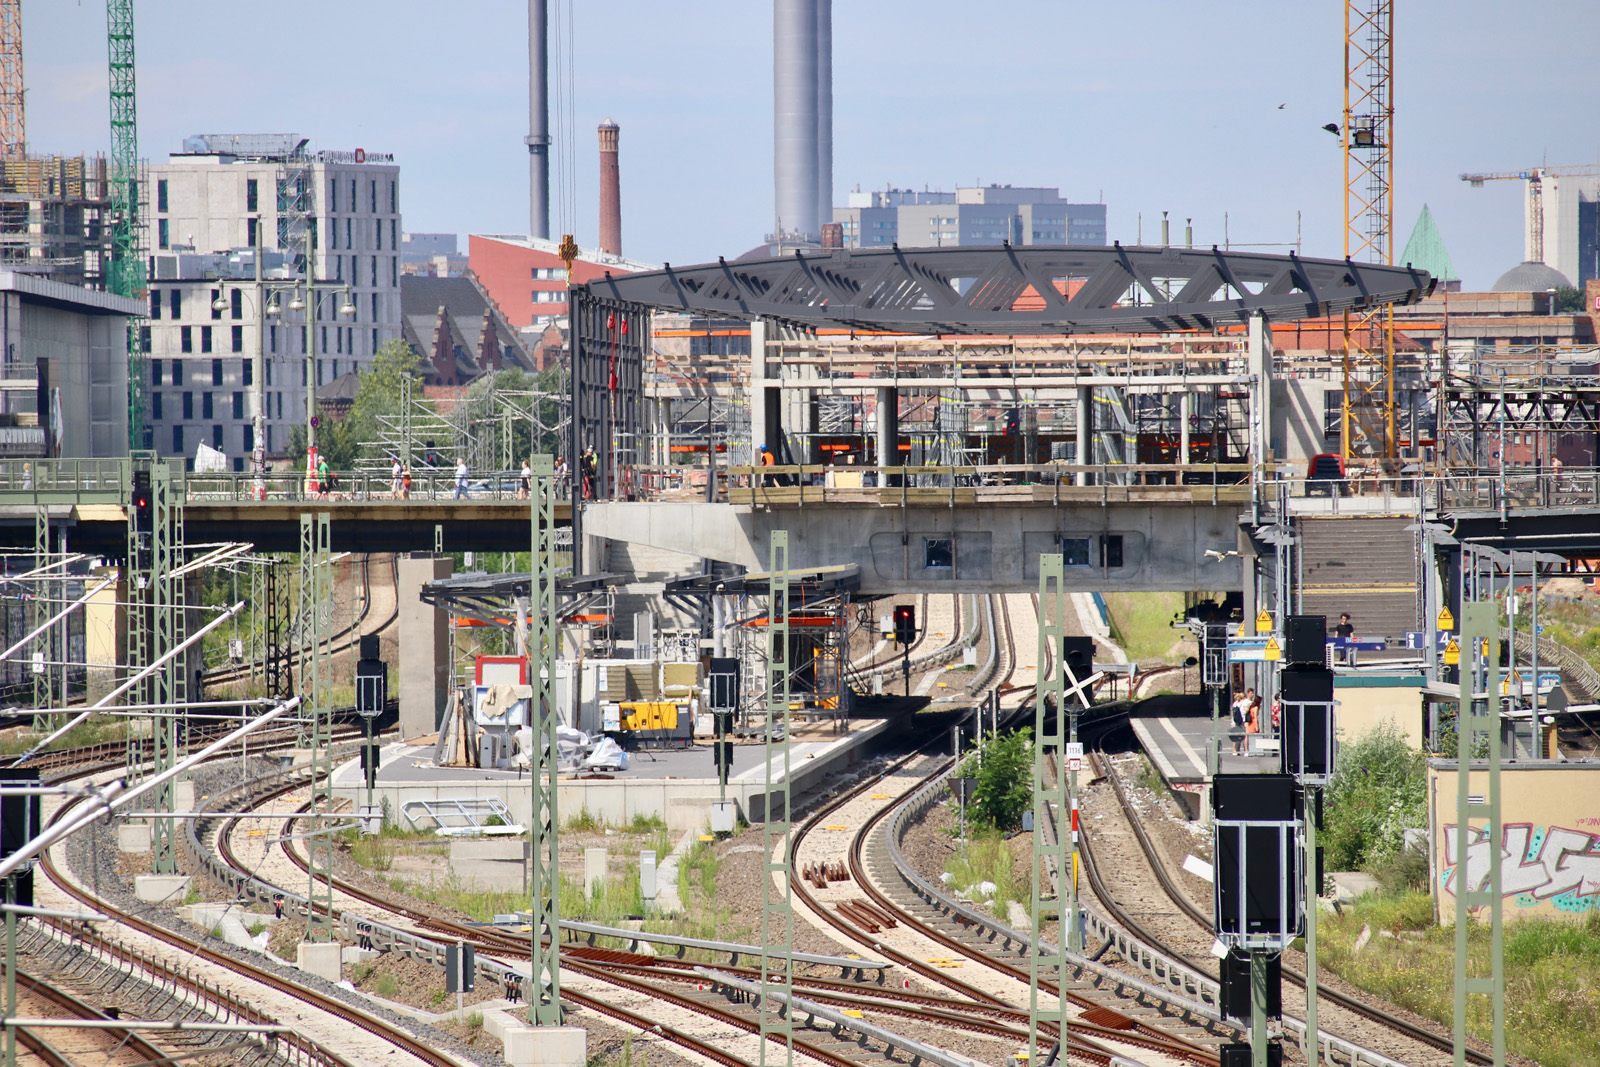 baustelle-ostkreuz-august-2017-25.jpg